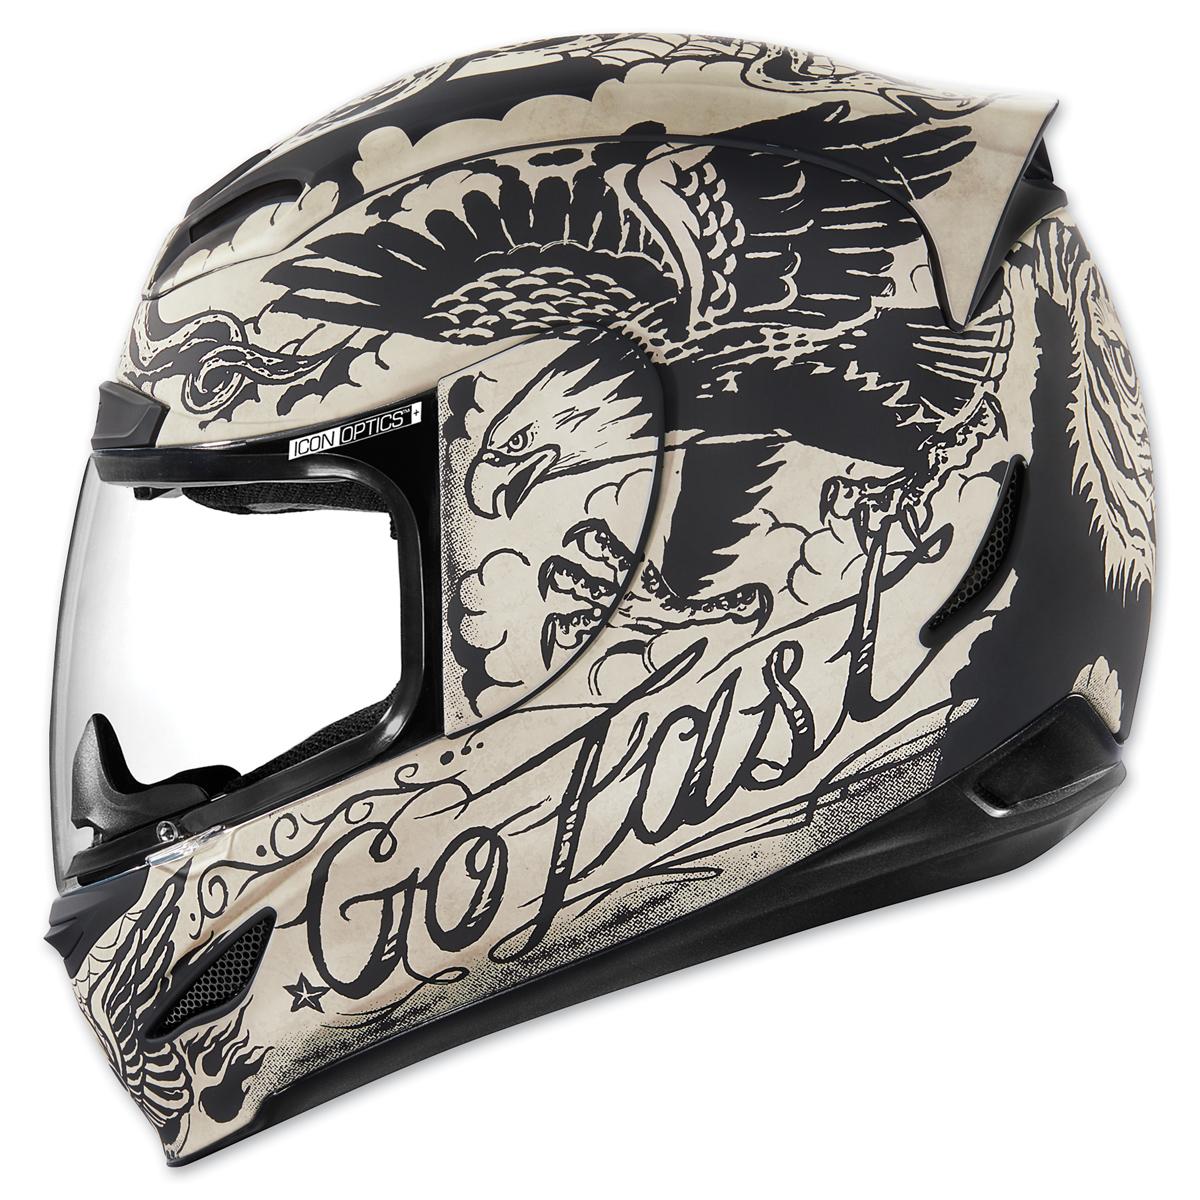 icon motosports ride among us - HD quality